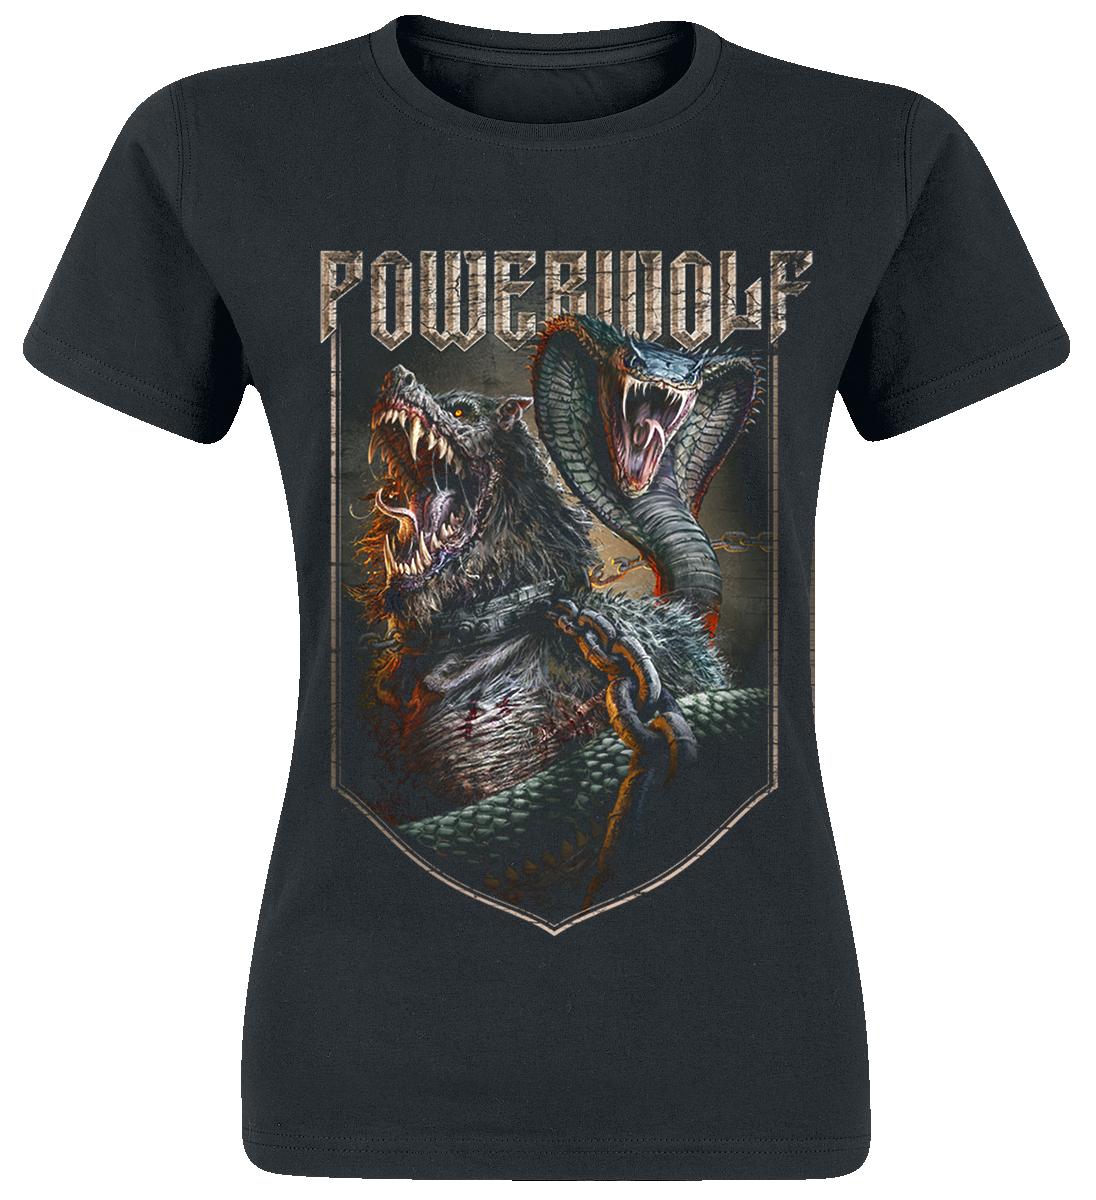 Powerwolf - Kiss Of The Cobra King - Girls shirt - black image